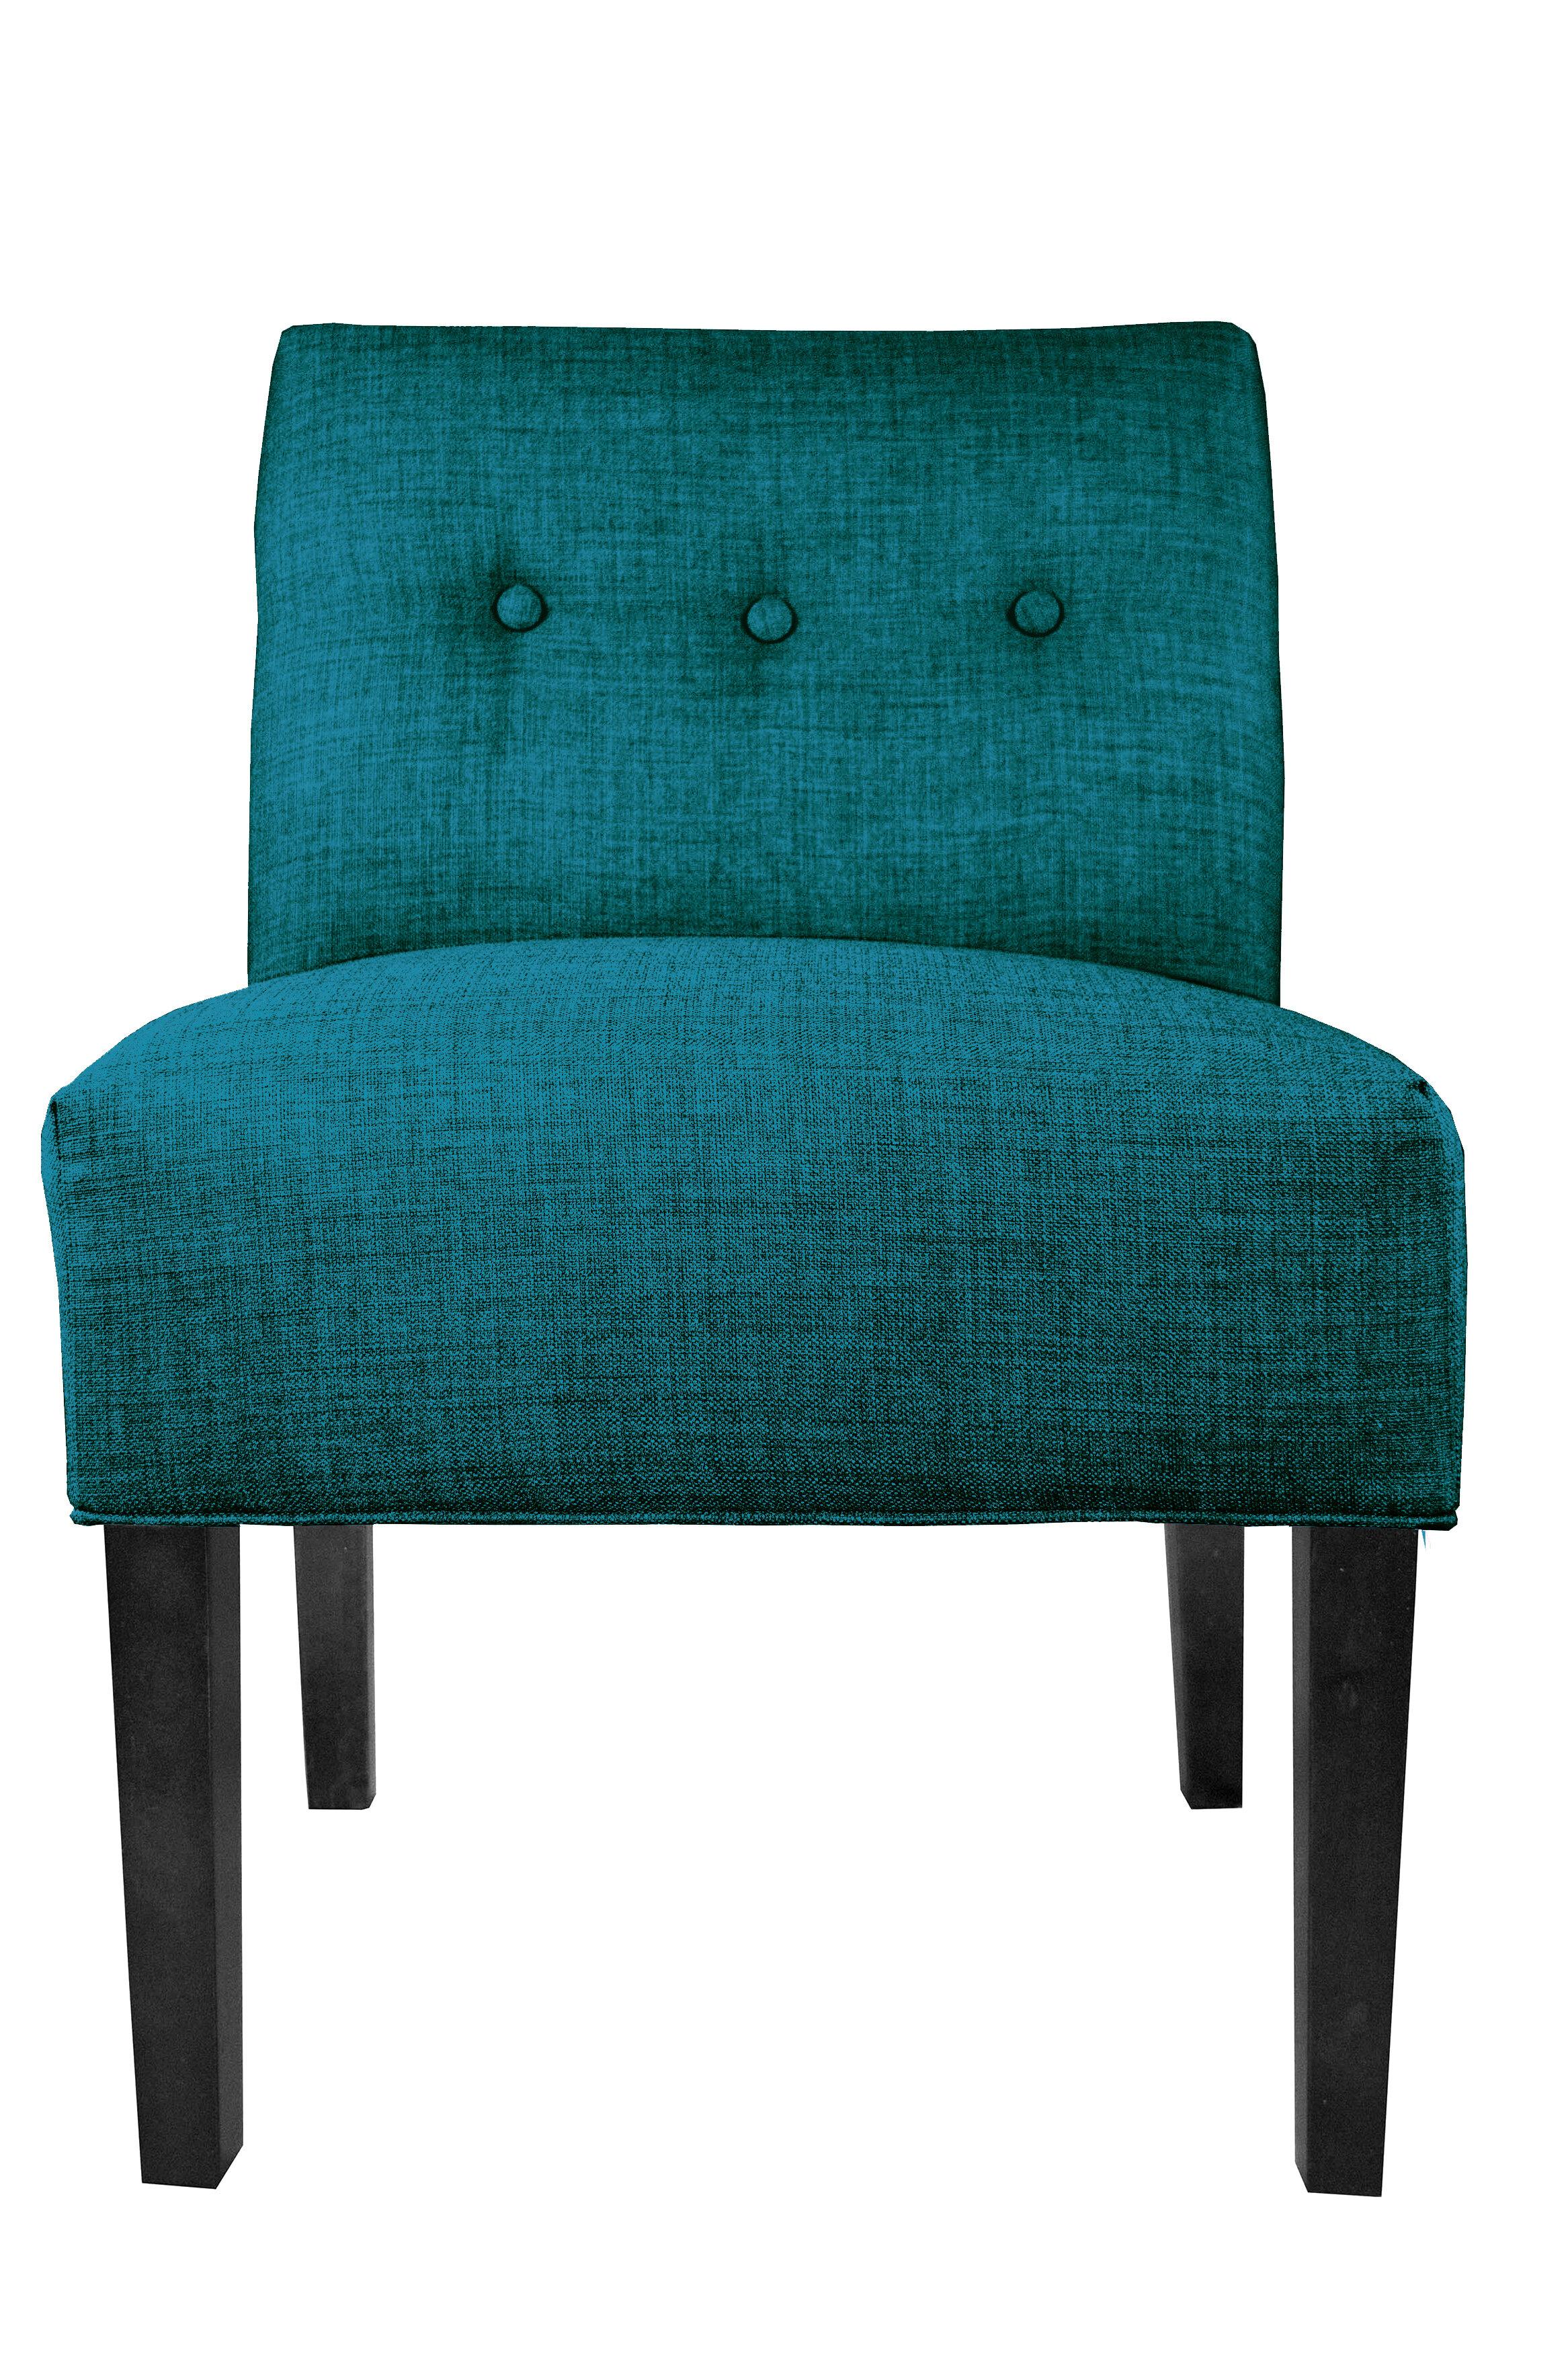 Ordinaire MJLFurniture Key Largo Slipper Chair U0026 Reviews | Wayfair